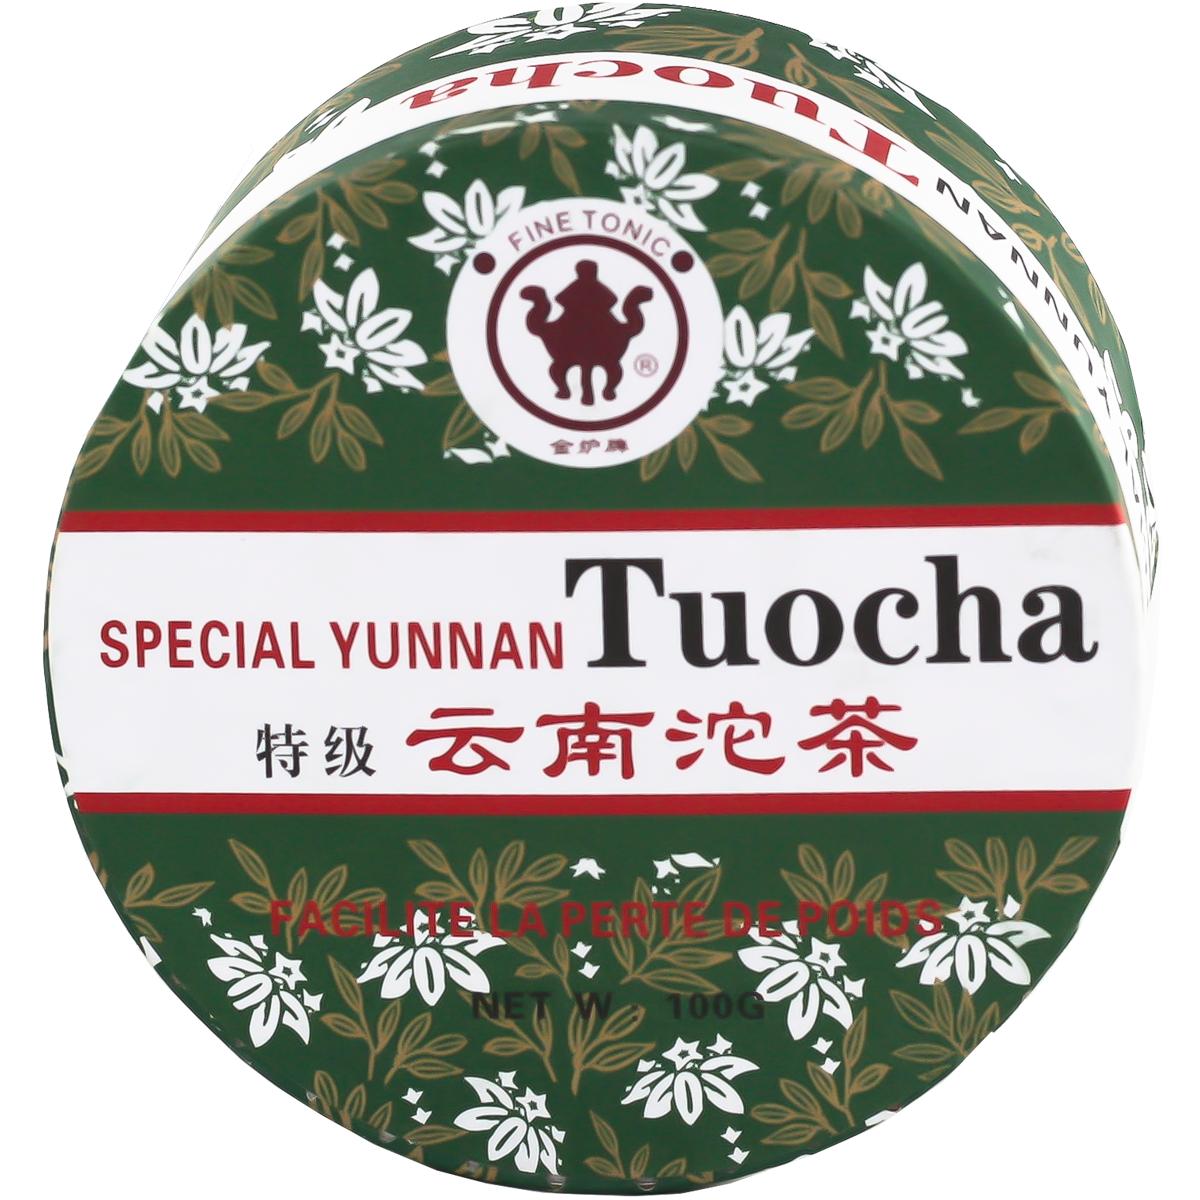 Tuocha Rond 100g Image